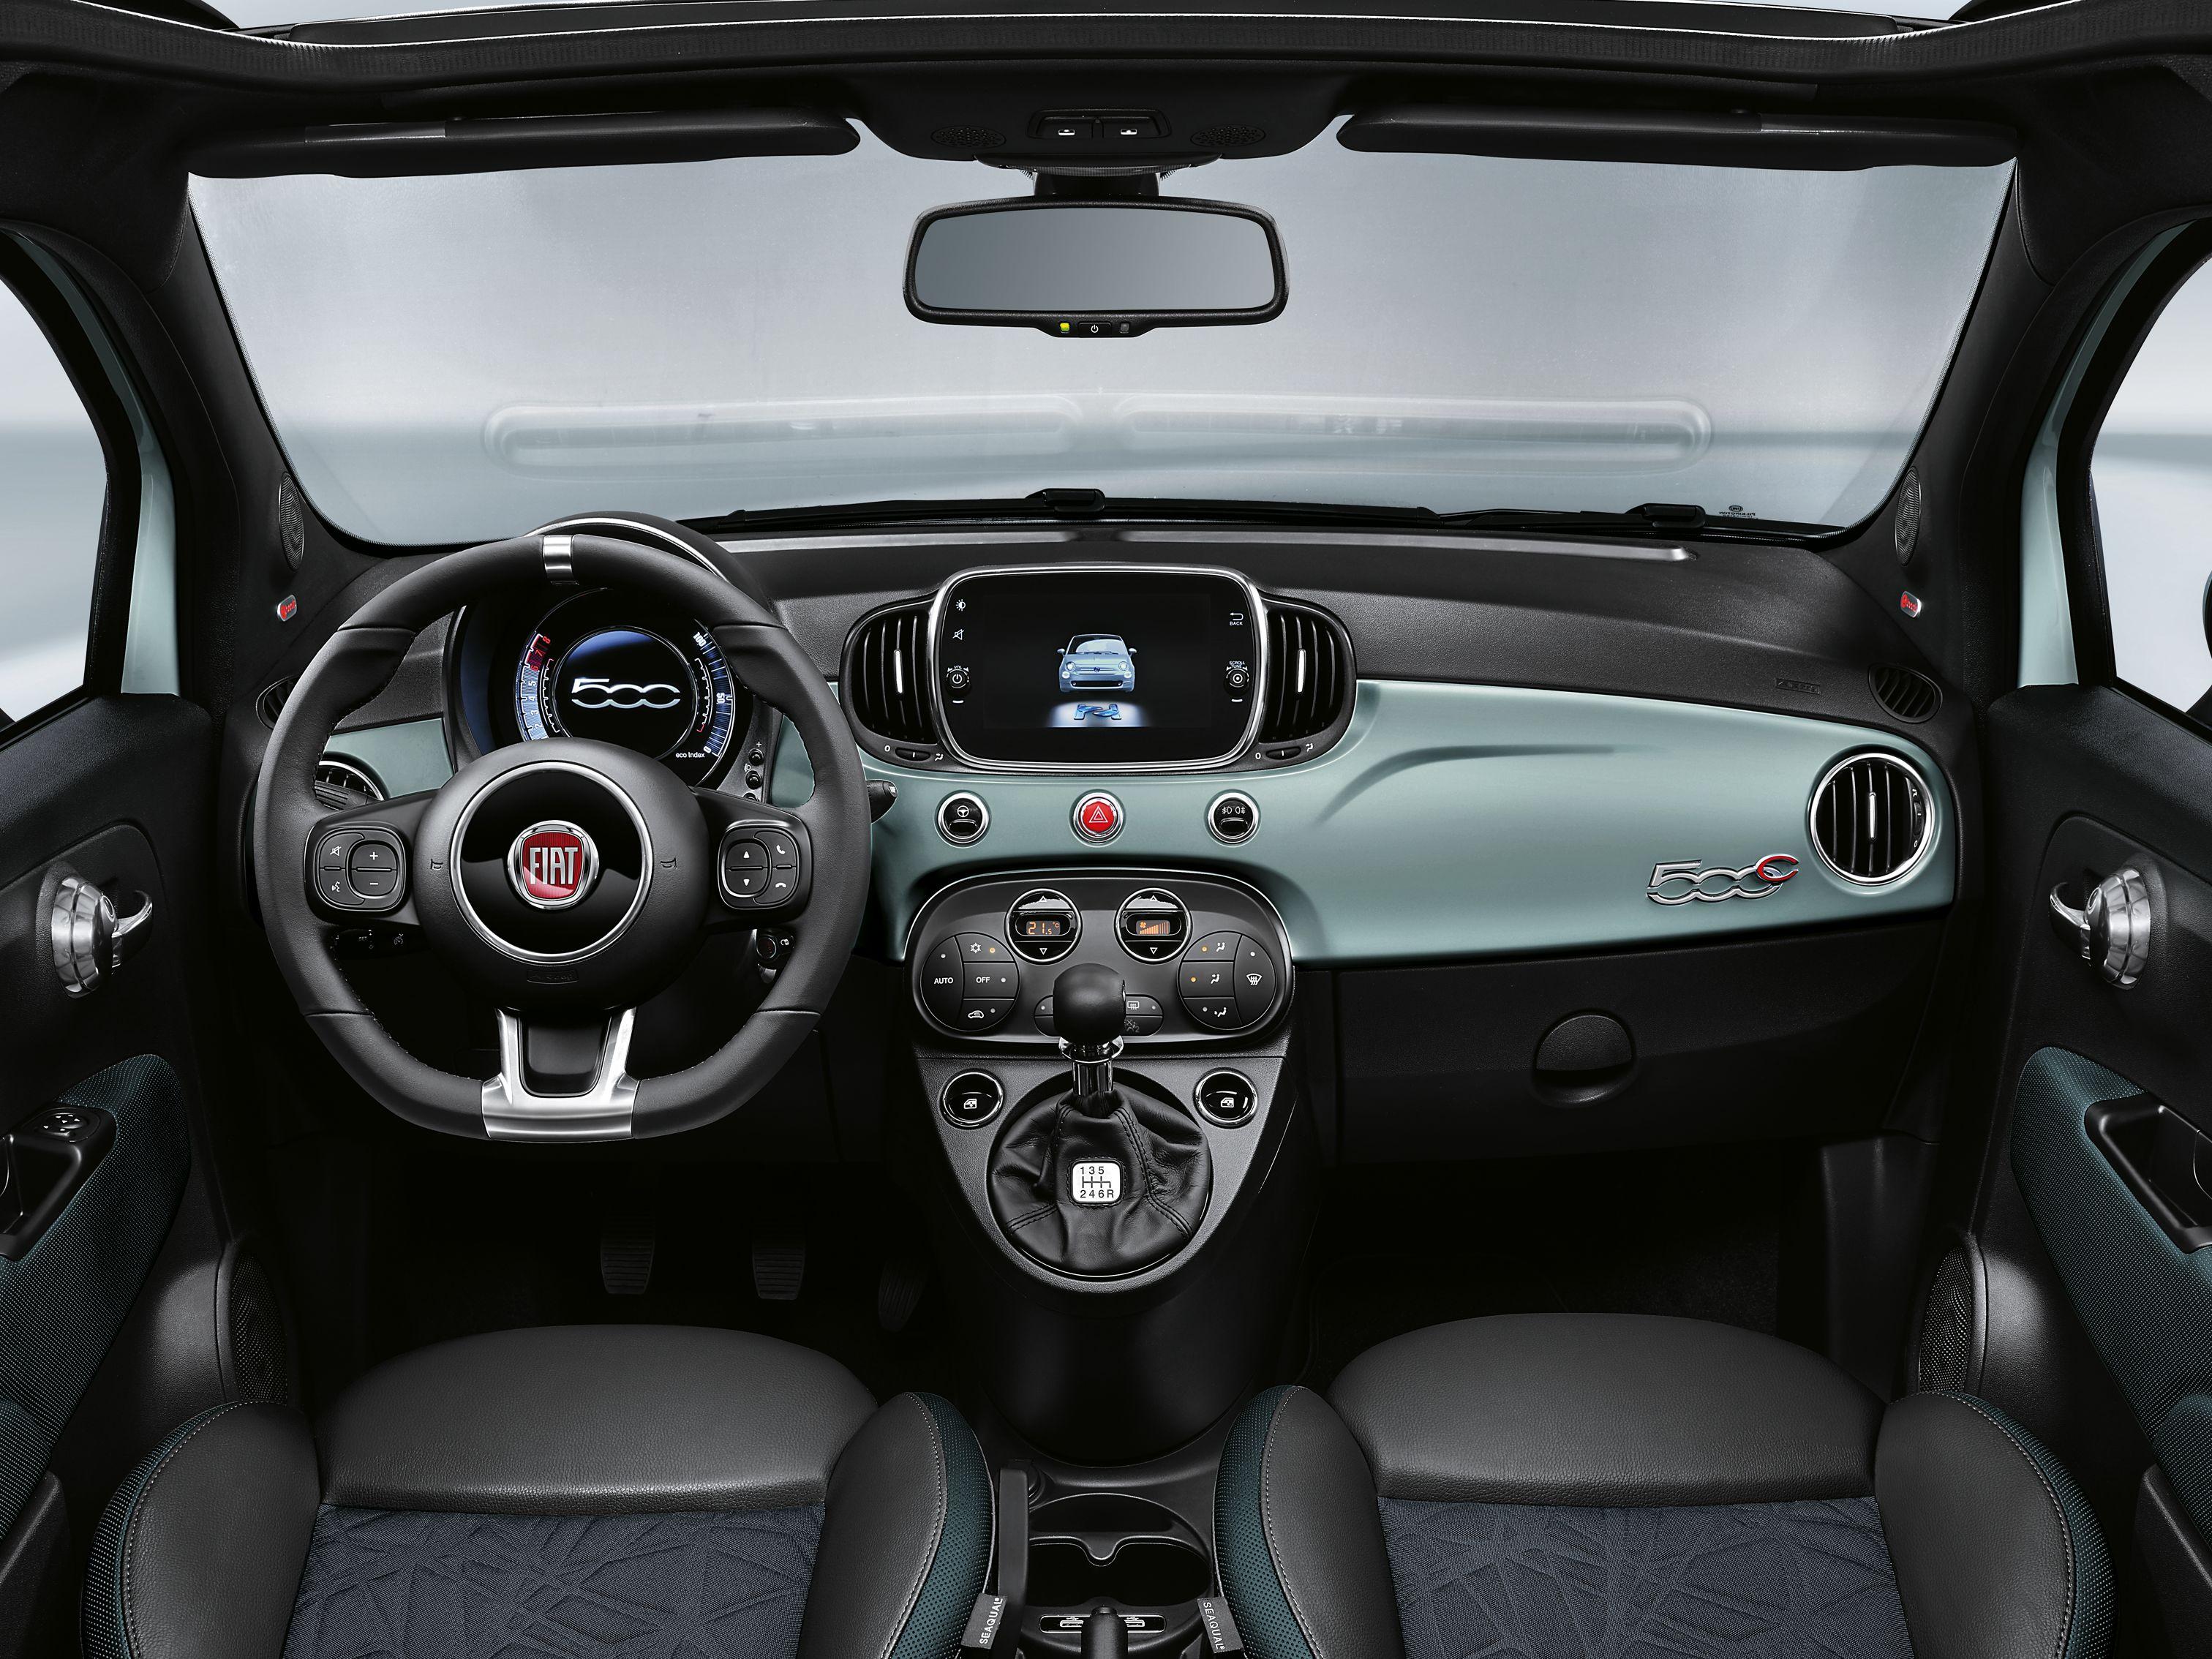 Fiat 500 Cockpit